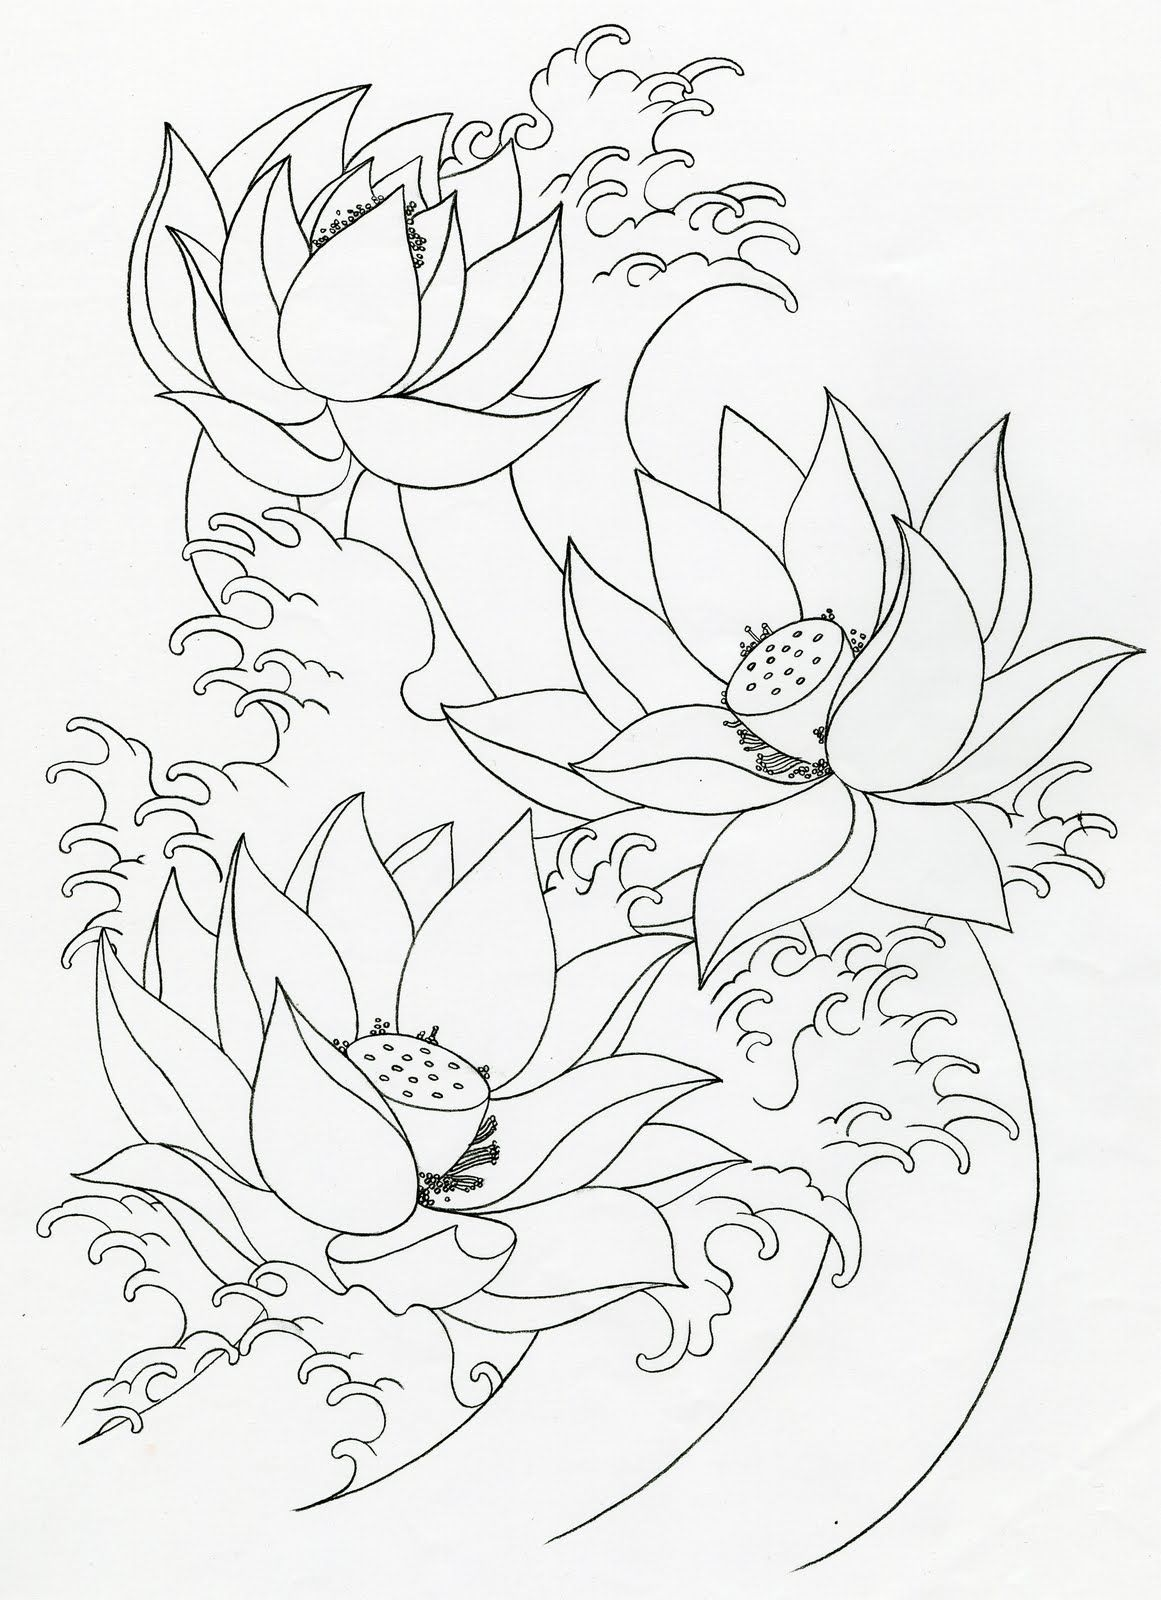 Lotus Flower Tattoos Free Tattoo Ideas Lotus Flower Tattoo Design Flower Tattoo Drawings Lotus Flower Drawing